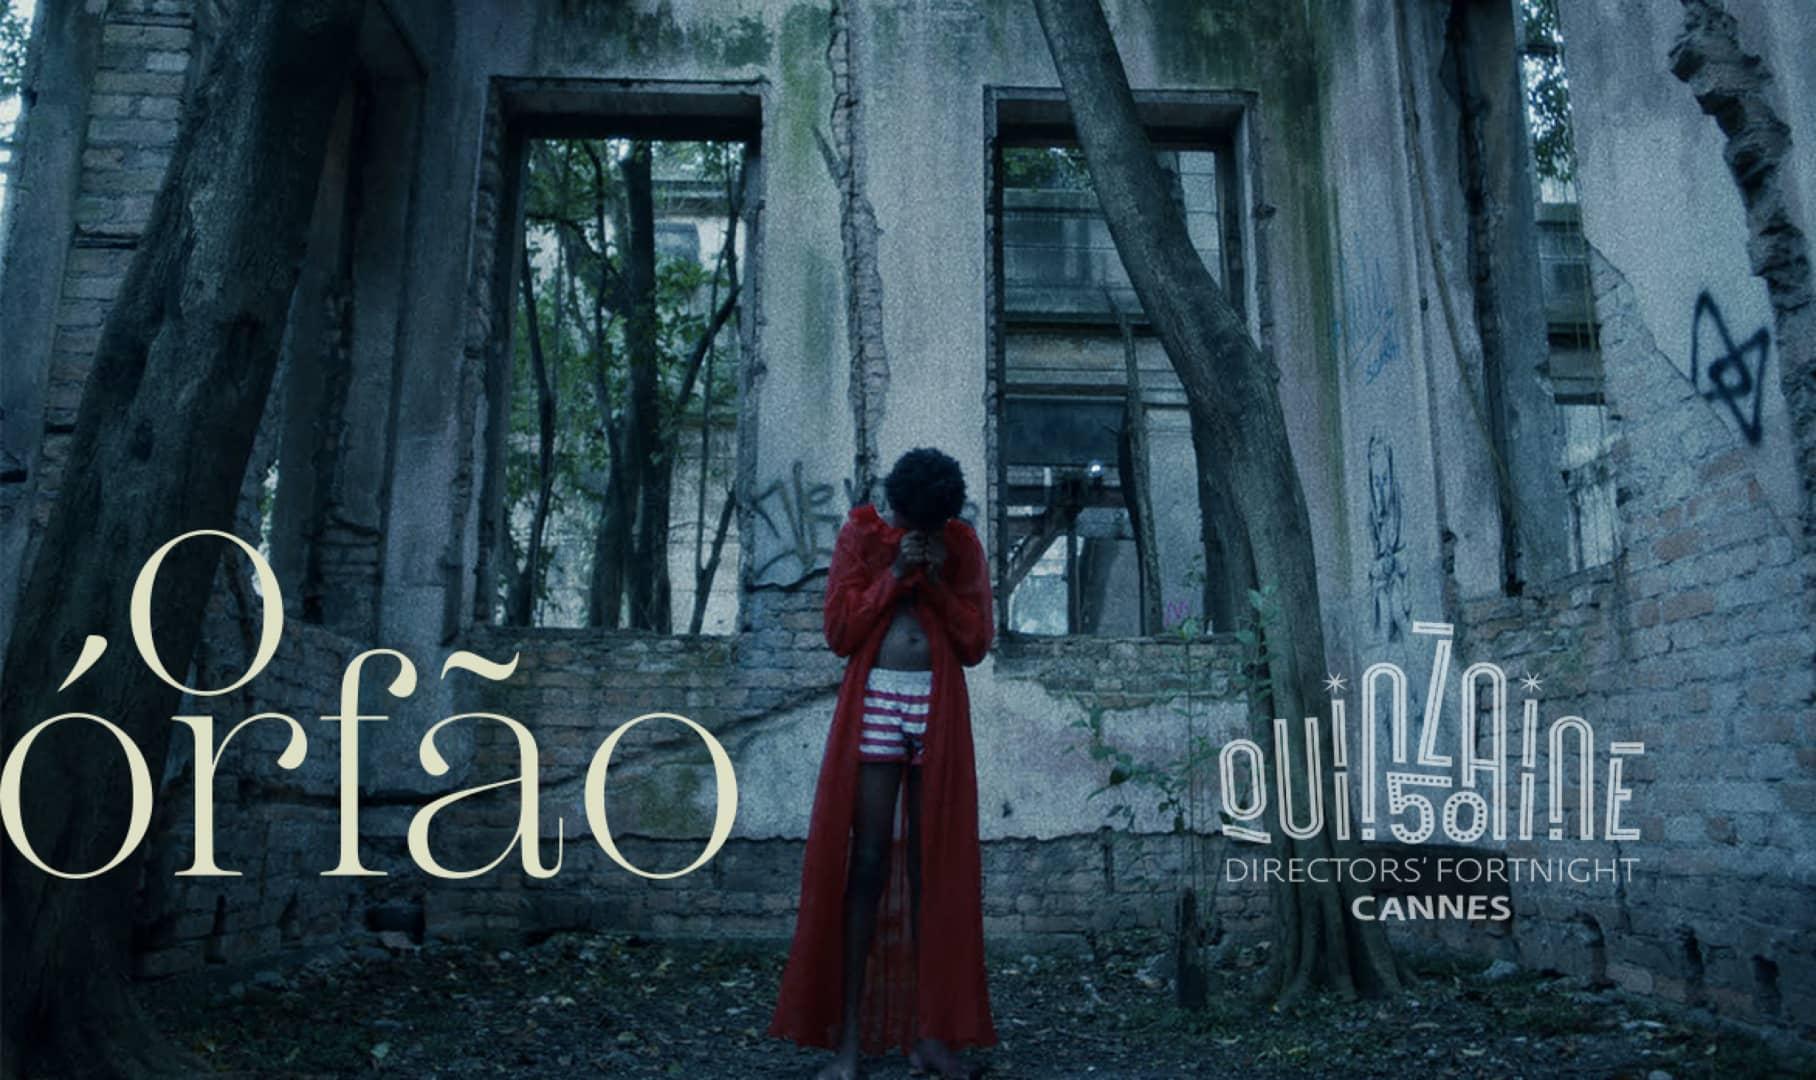 O Orfao Affiche 01 - RCM 2019